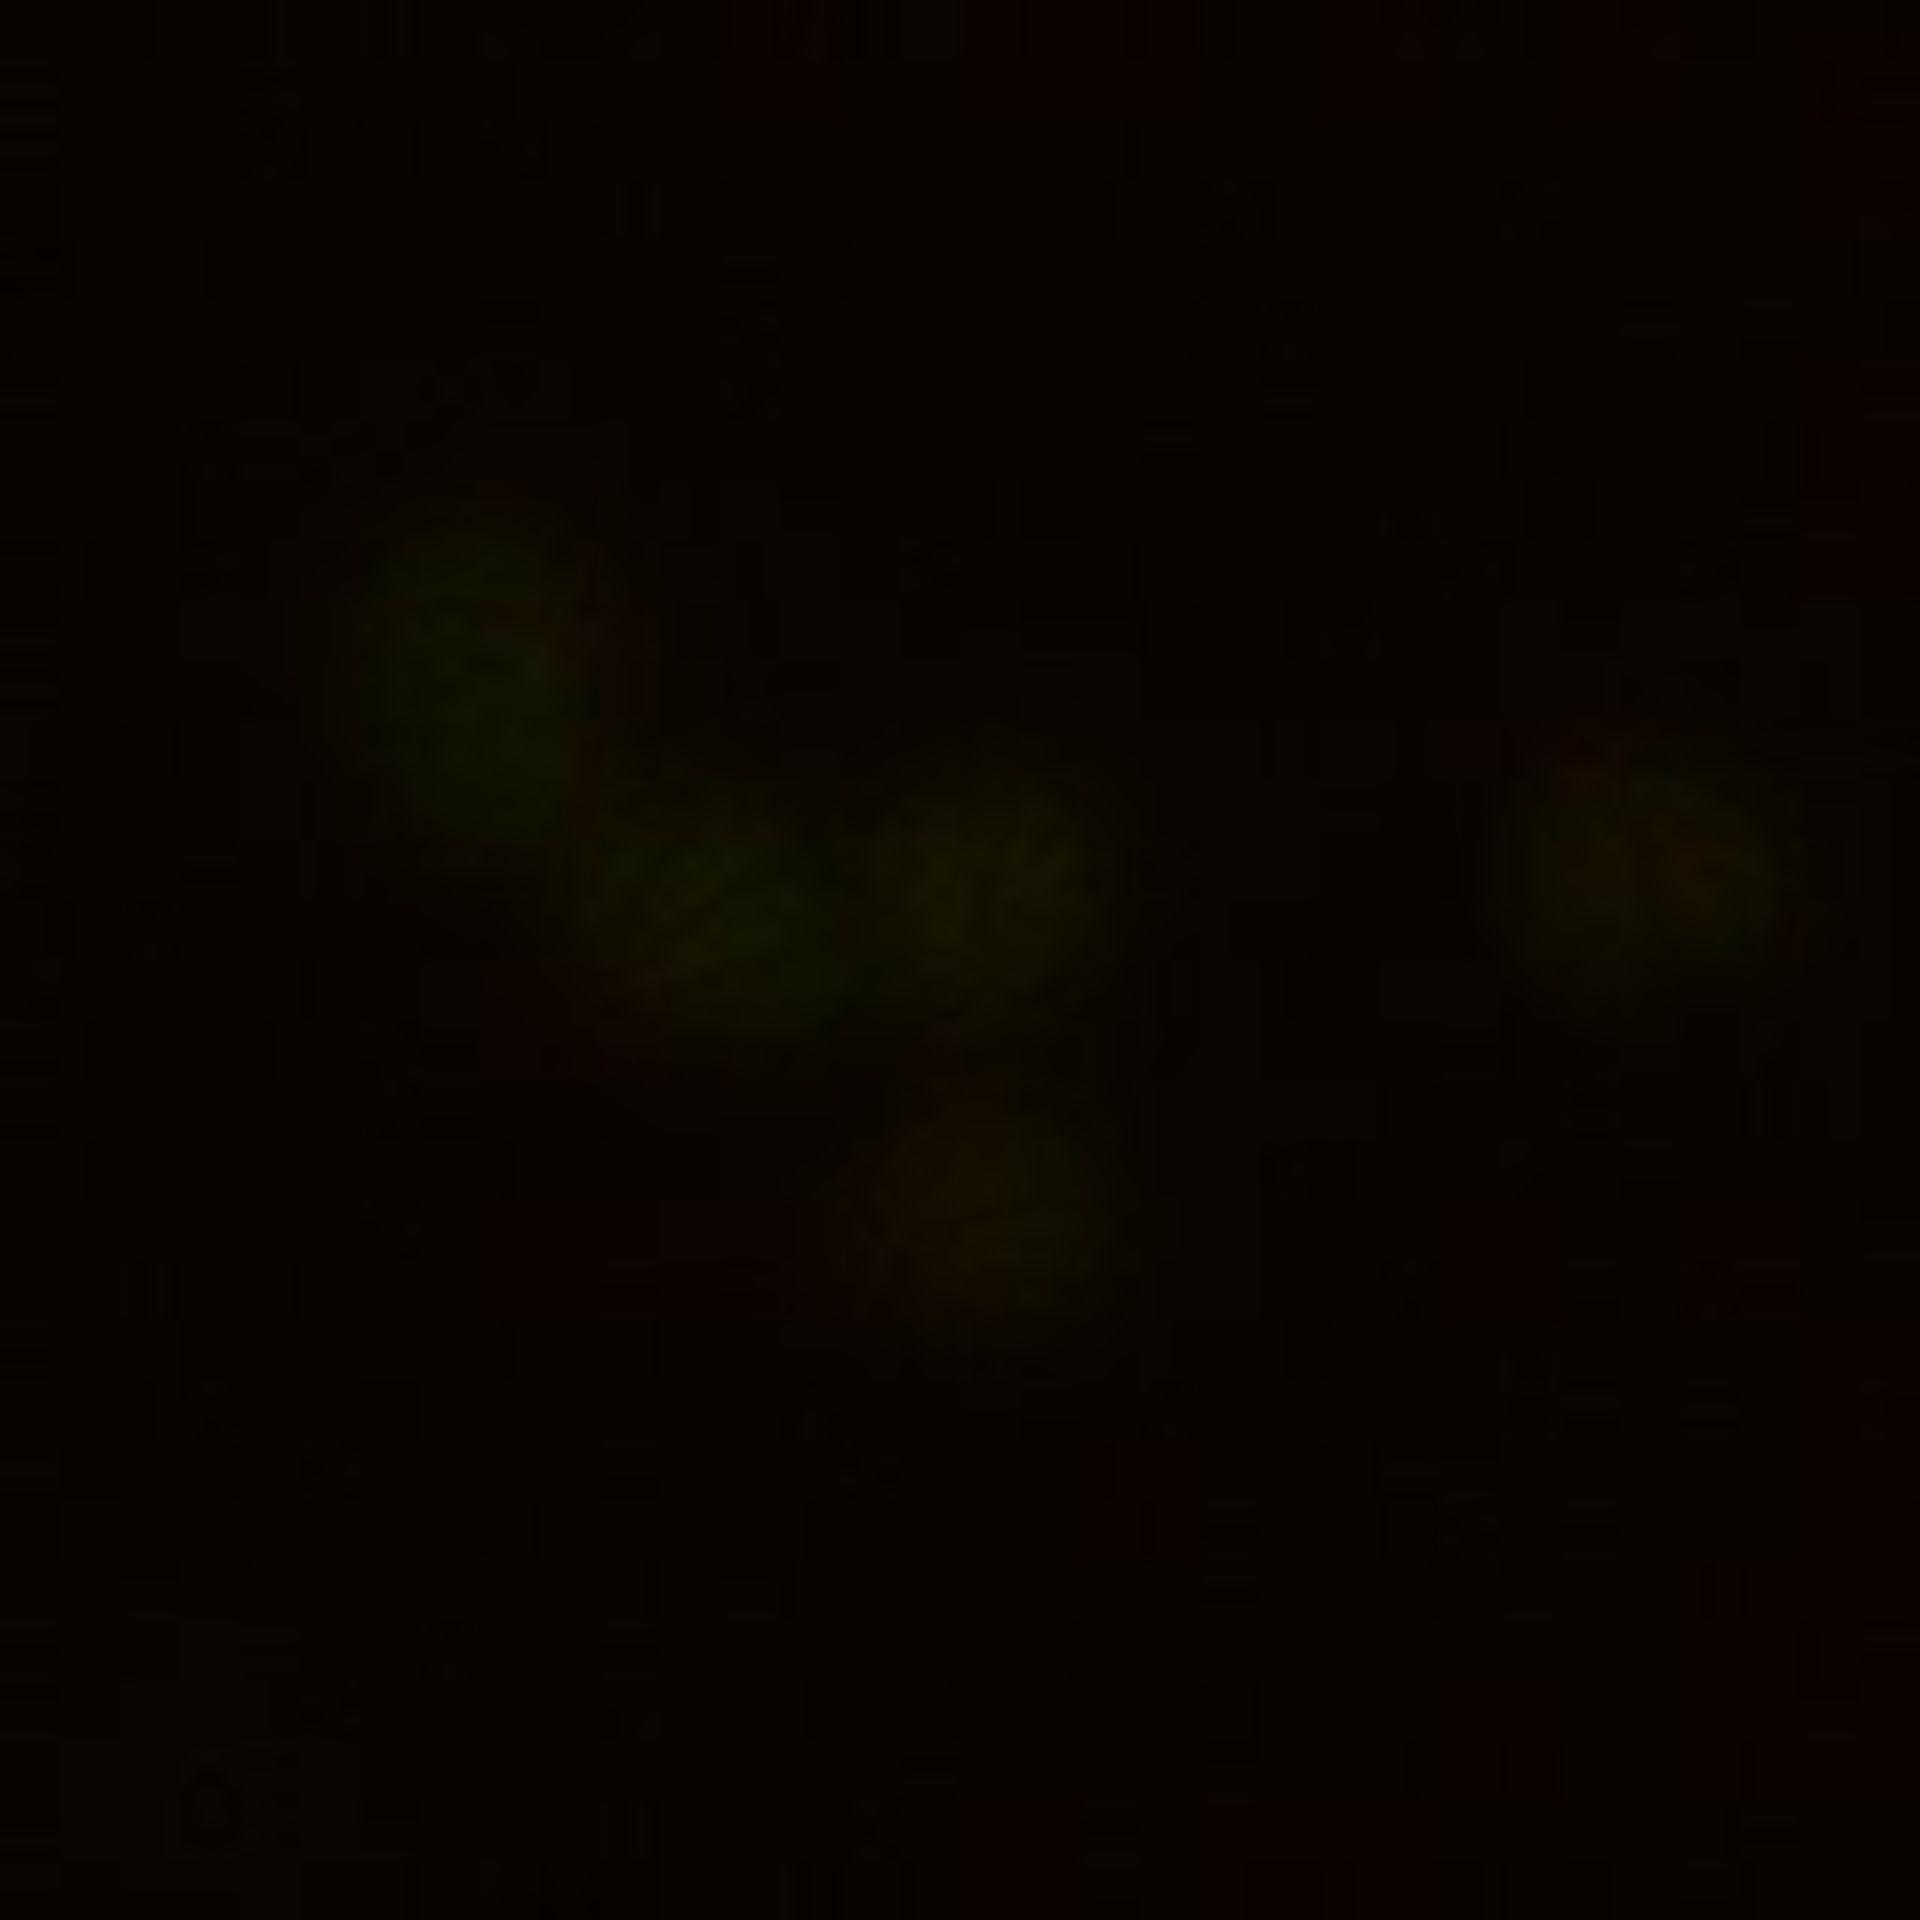 Toxoplasma gondii RH (parte basale delle cellule) - CIL:10523